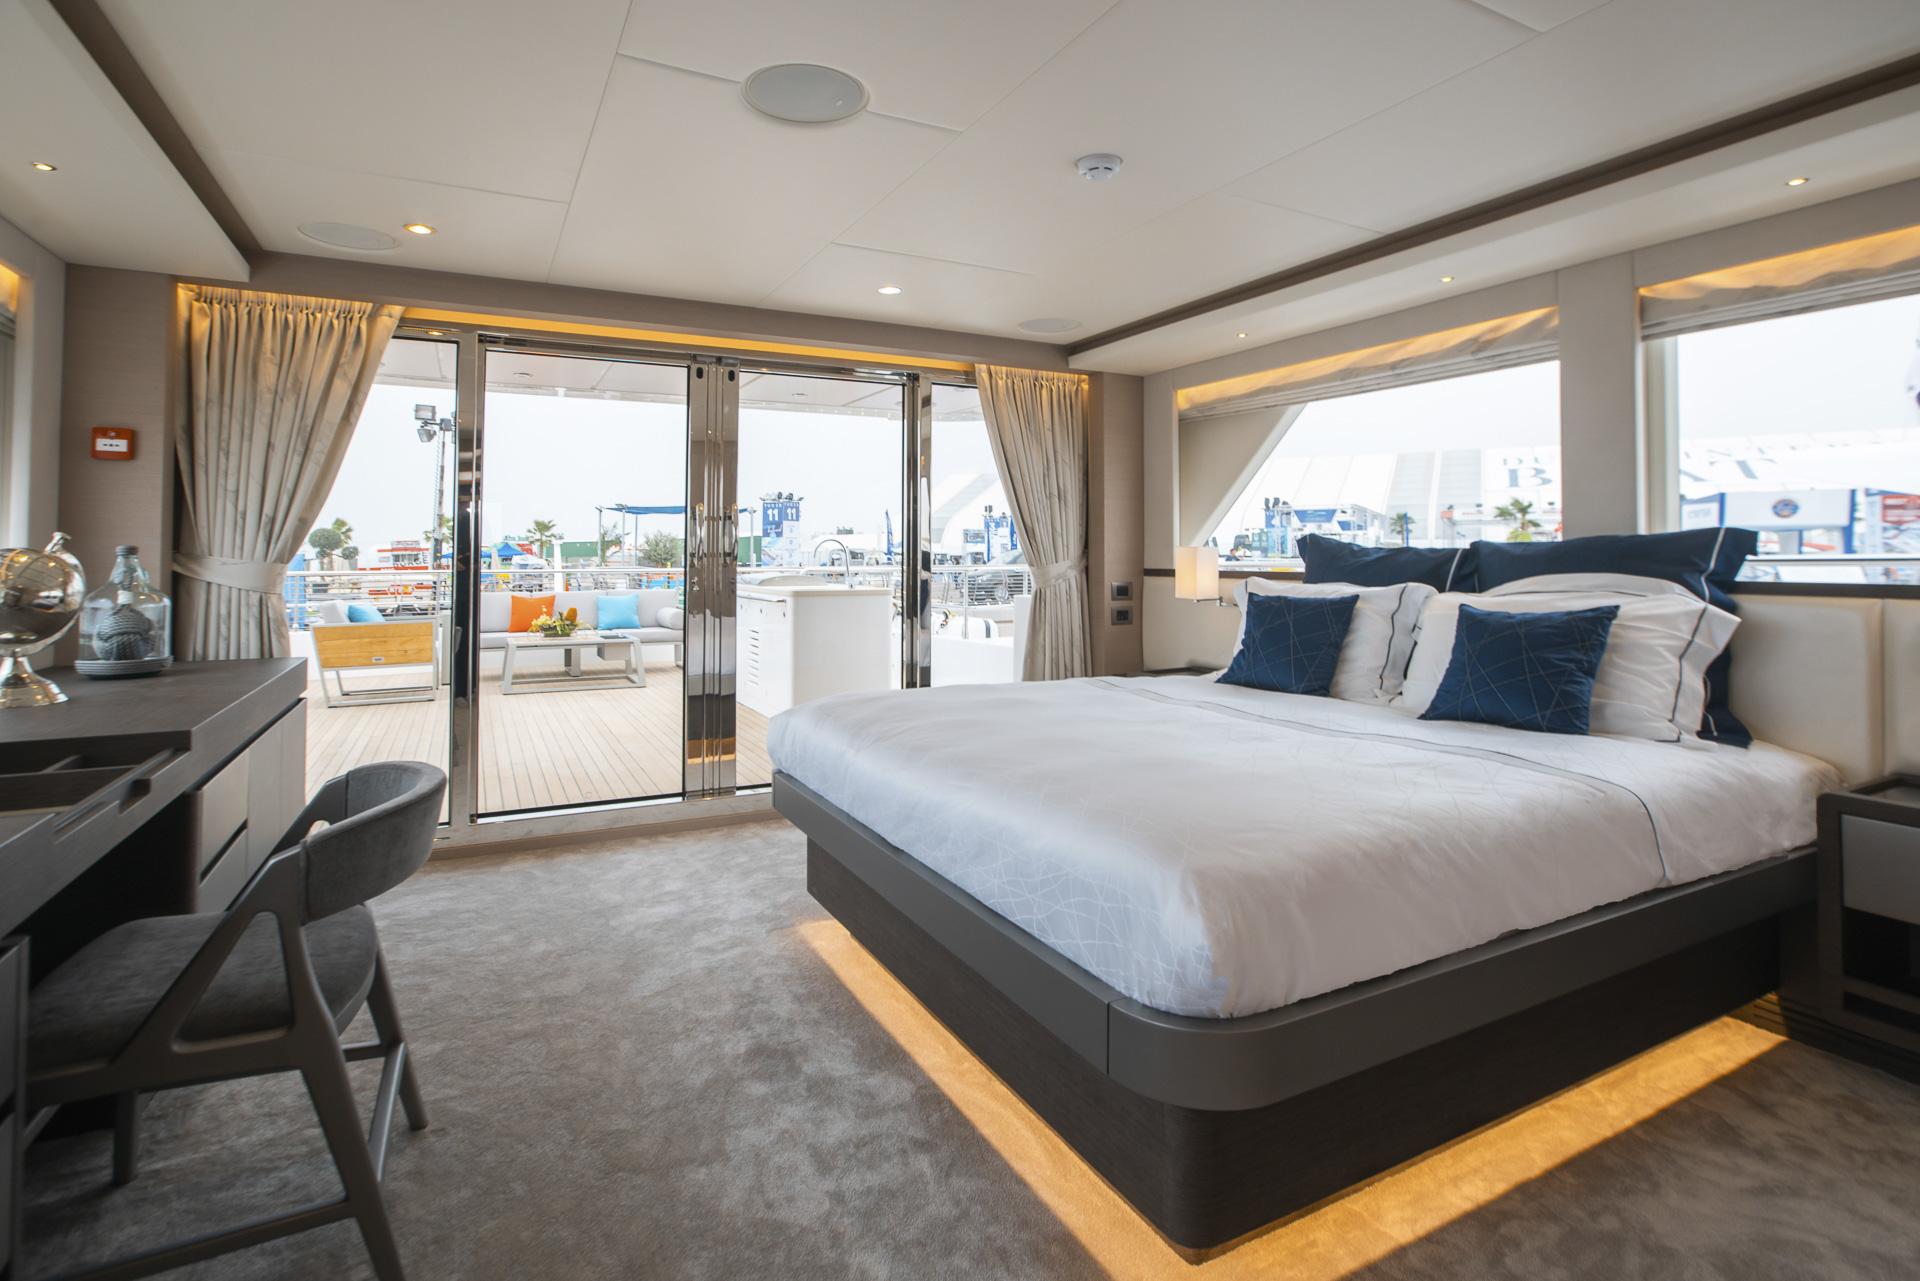 Upper Deck VIP Stateroom (1)